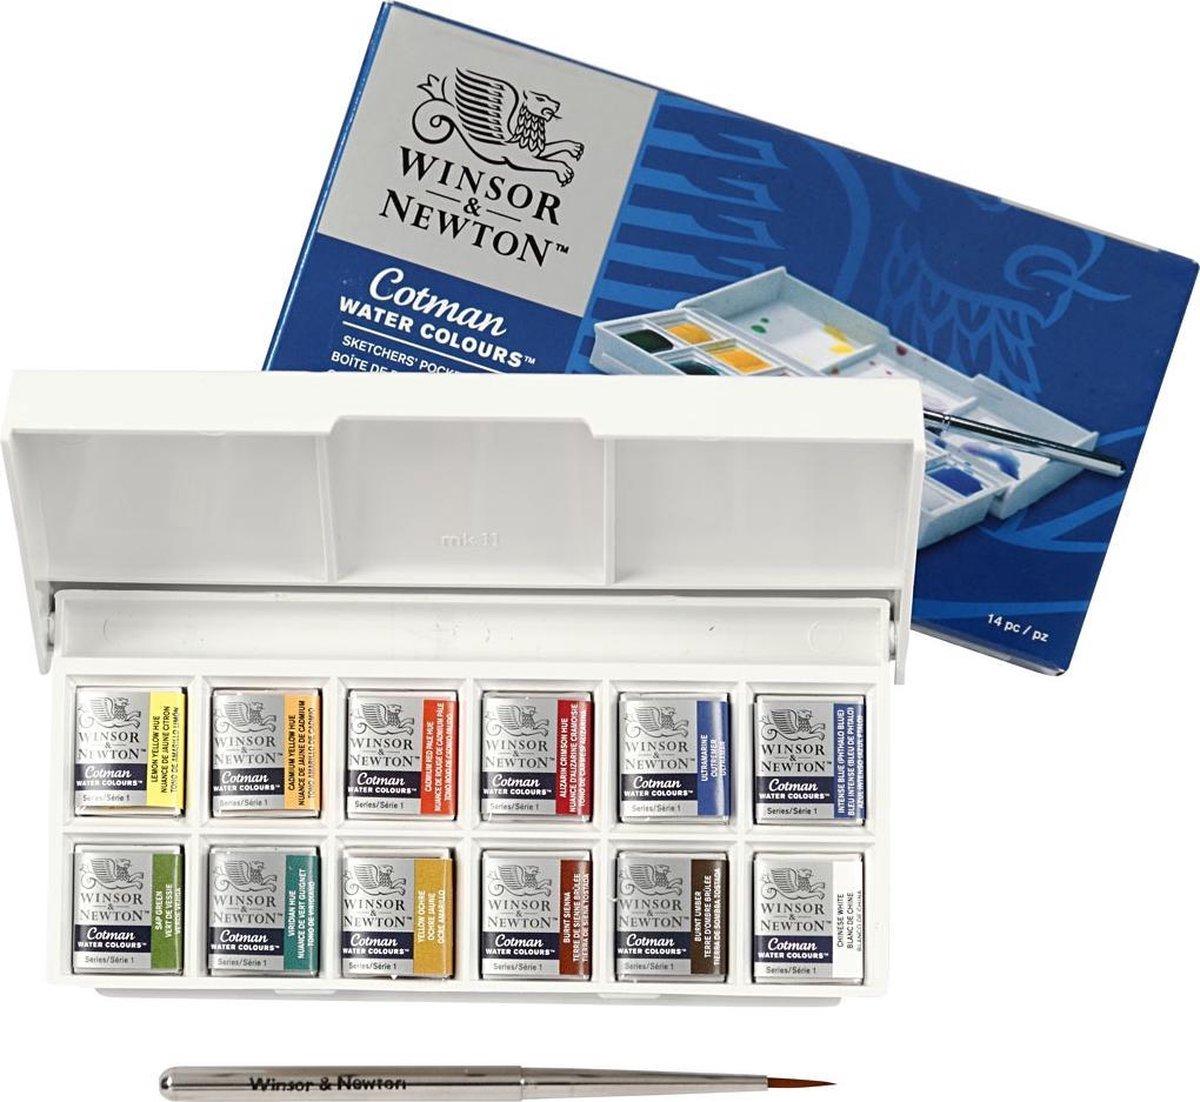 Winsor & Newton Cotman Sketchers Pocket Box Aquarelset 12 halve napjes + penseel